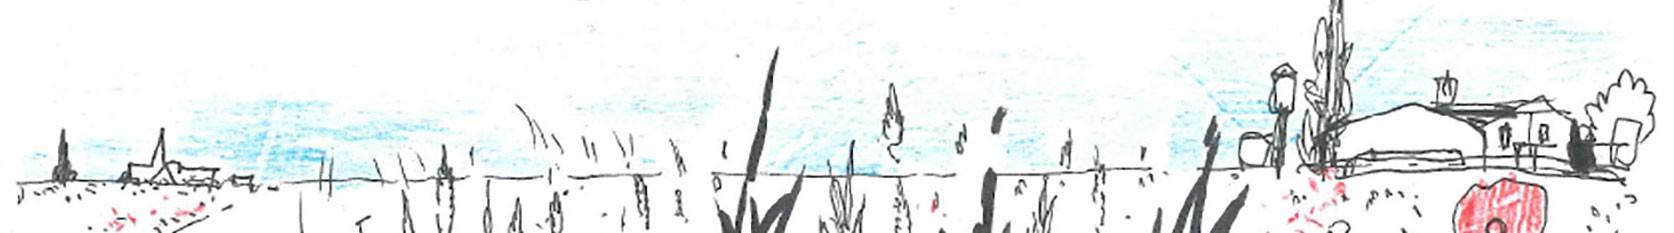 cropped-Campagne1_1674x233.jpg